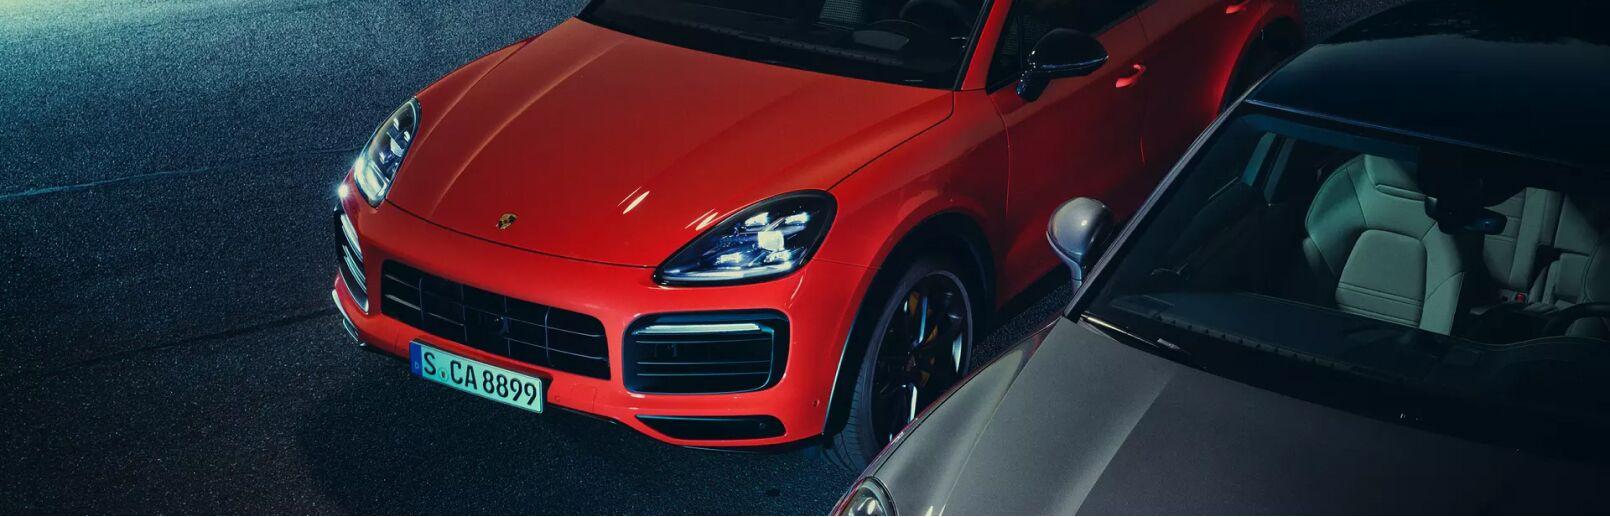 Loeber Porsche is a new and used Porsche dealership near Kenilworth, IL